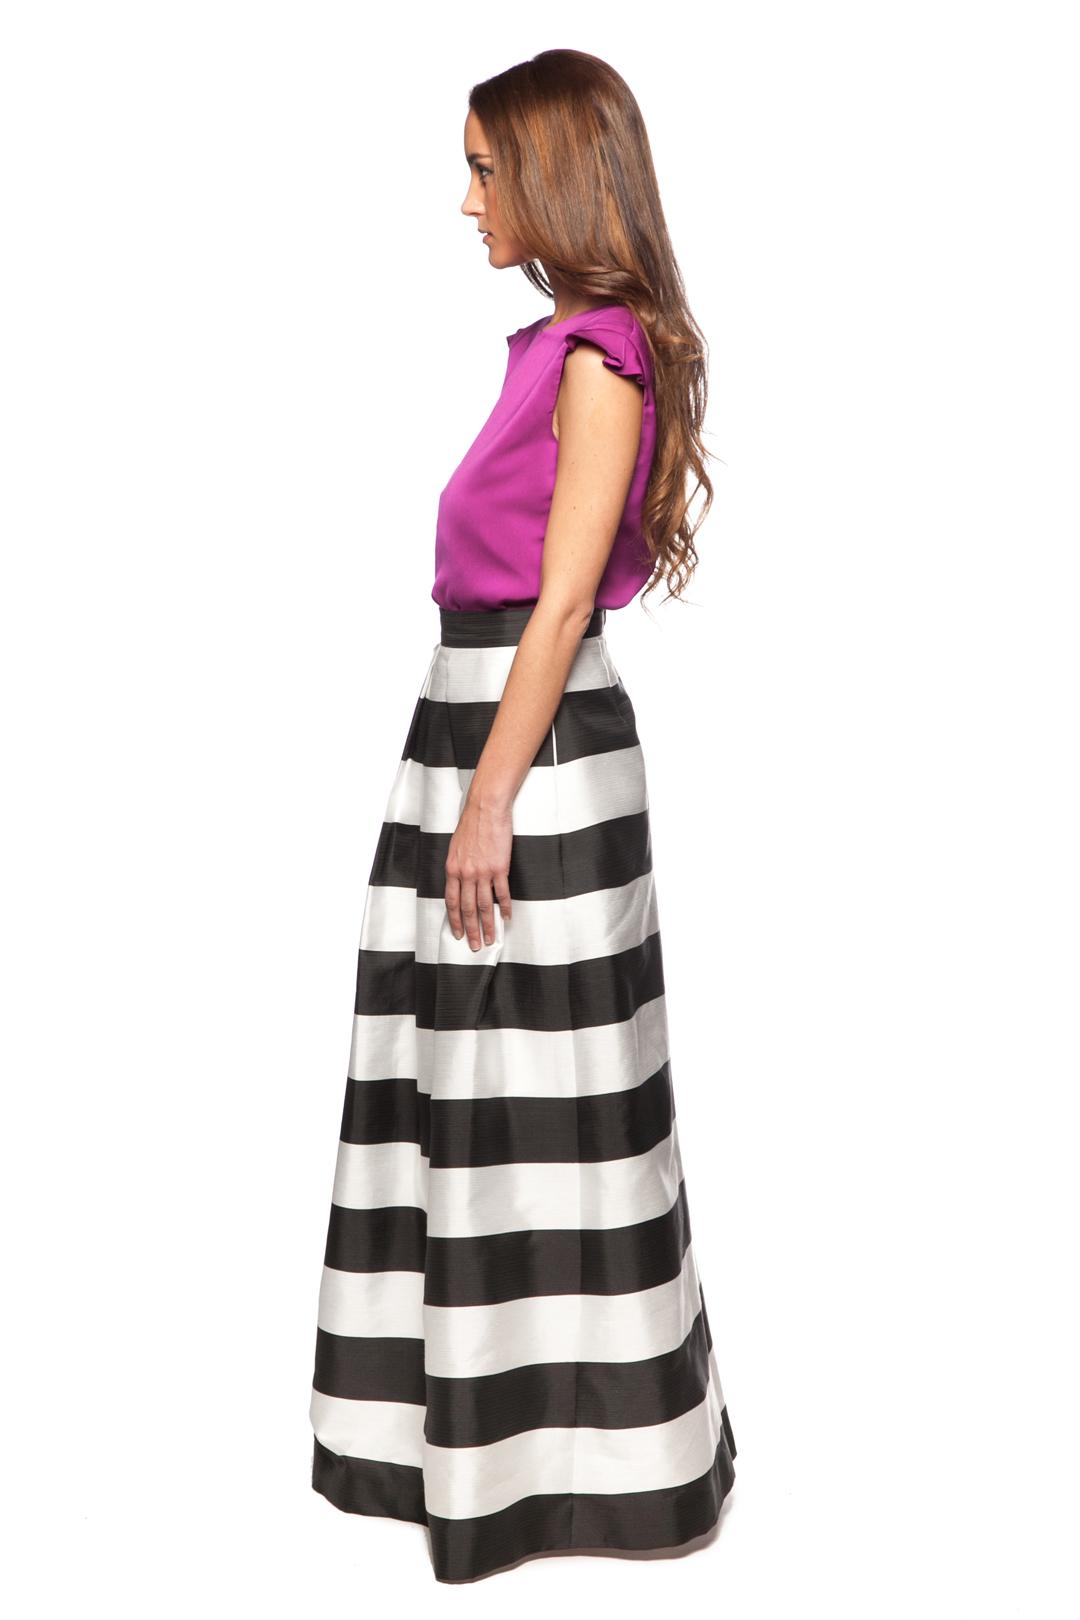 left - Falda Stripes Black and White